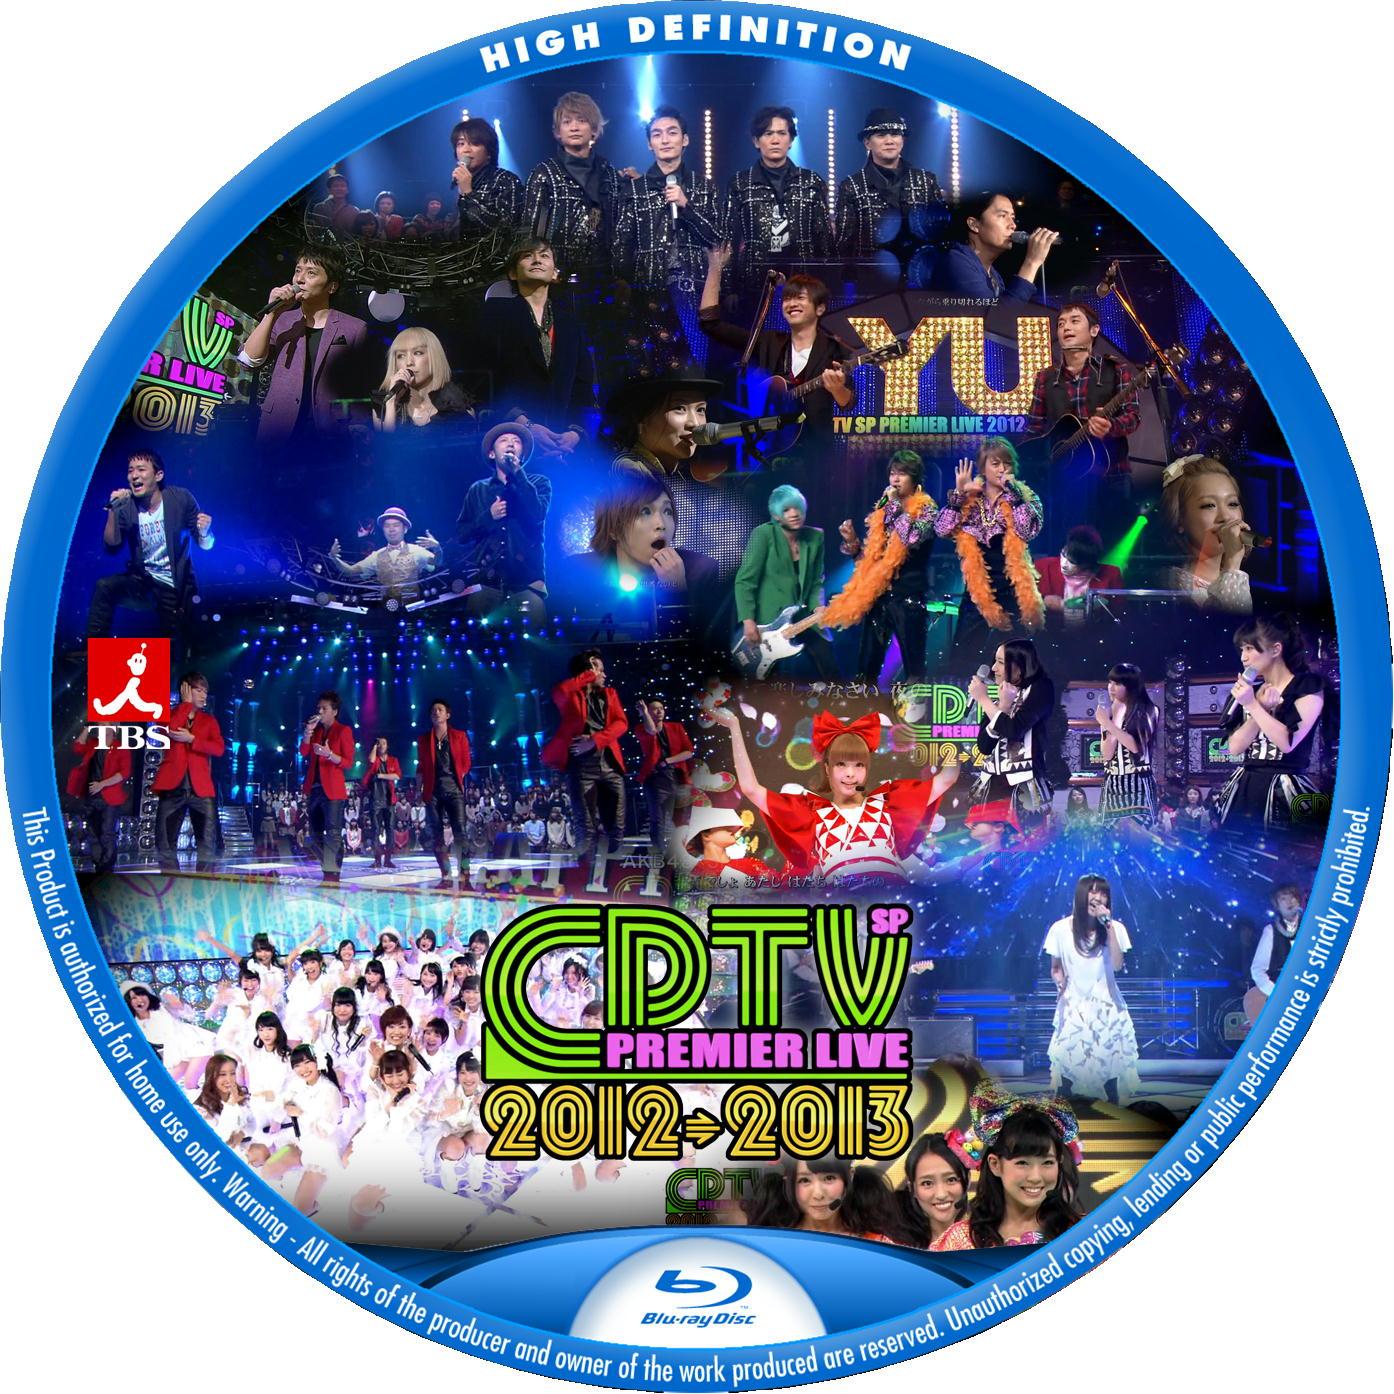 CDTV PREMIER LIVE 2012-2013 BDラベル